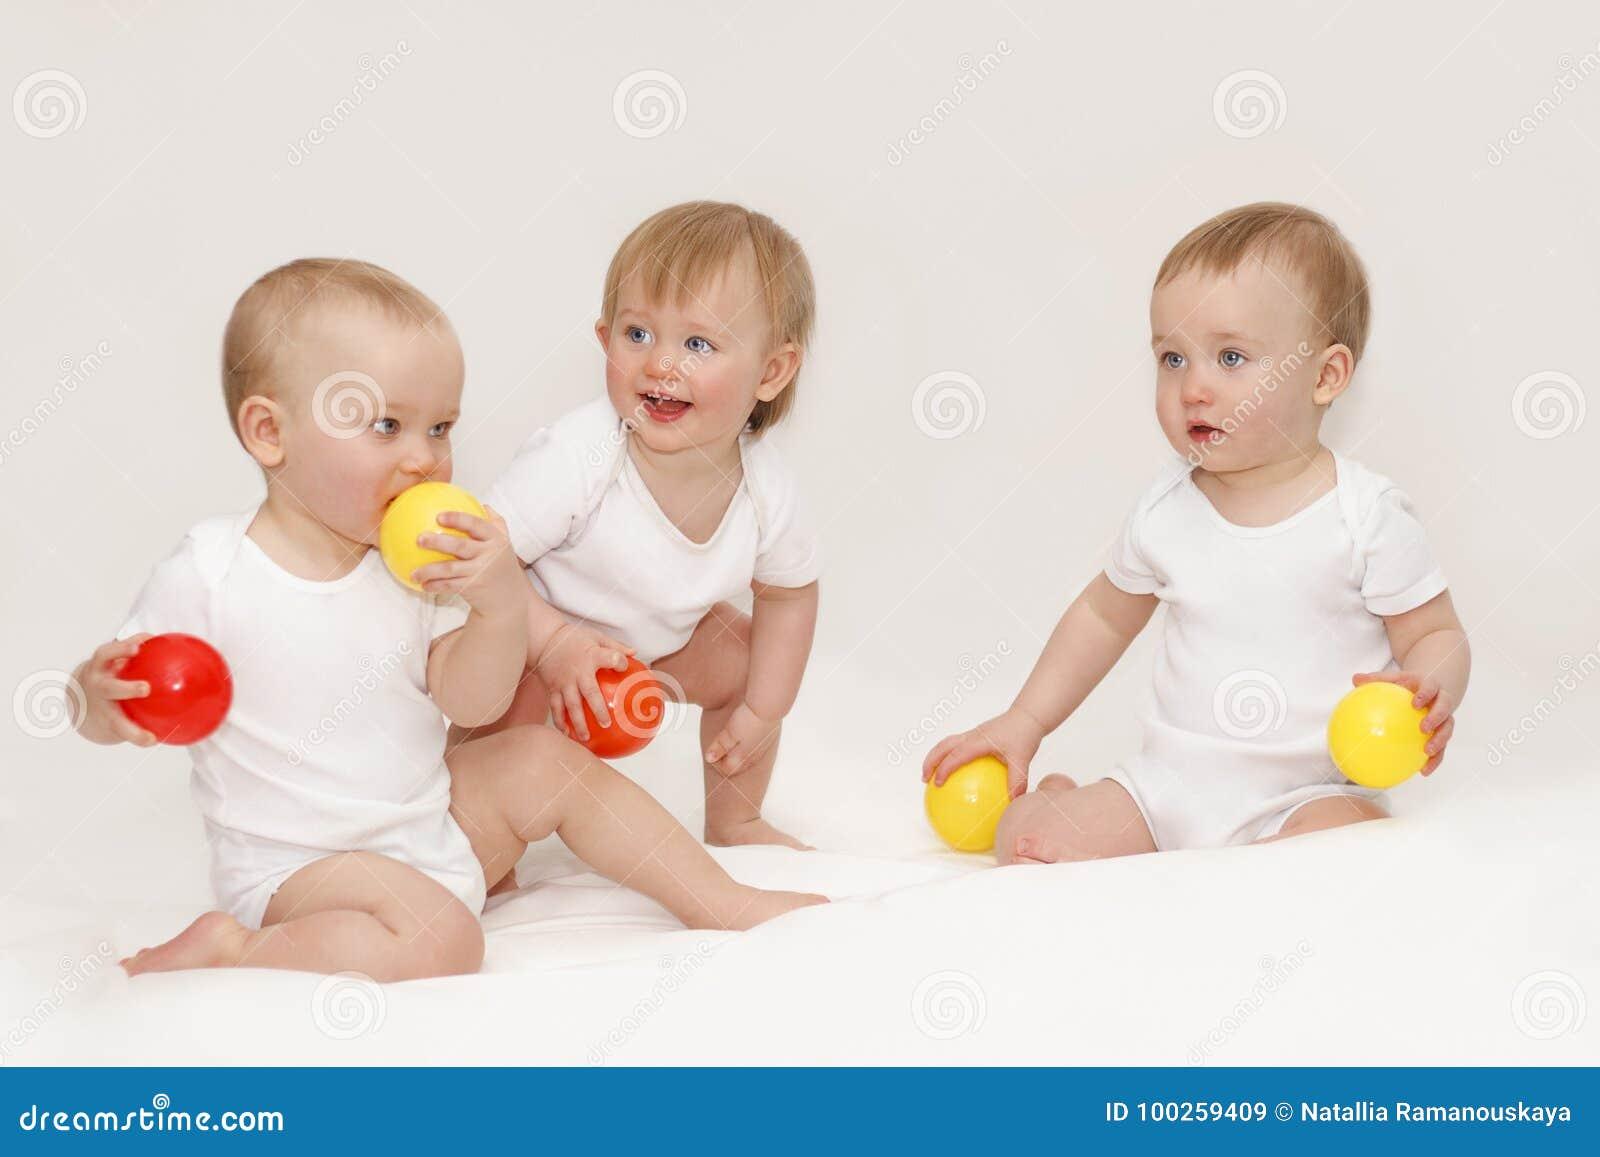 cb03584d9df8 Τρία παιδιά κάθονται στις άσπρες μπλούζες σε ένα άσπρο υπόβαθρο παιχνίδι  τρίδυμων σε ένα άσπρο υπόβαθρο